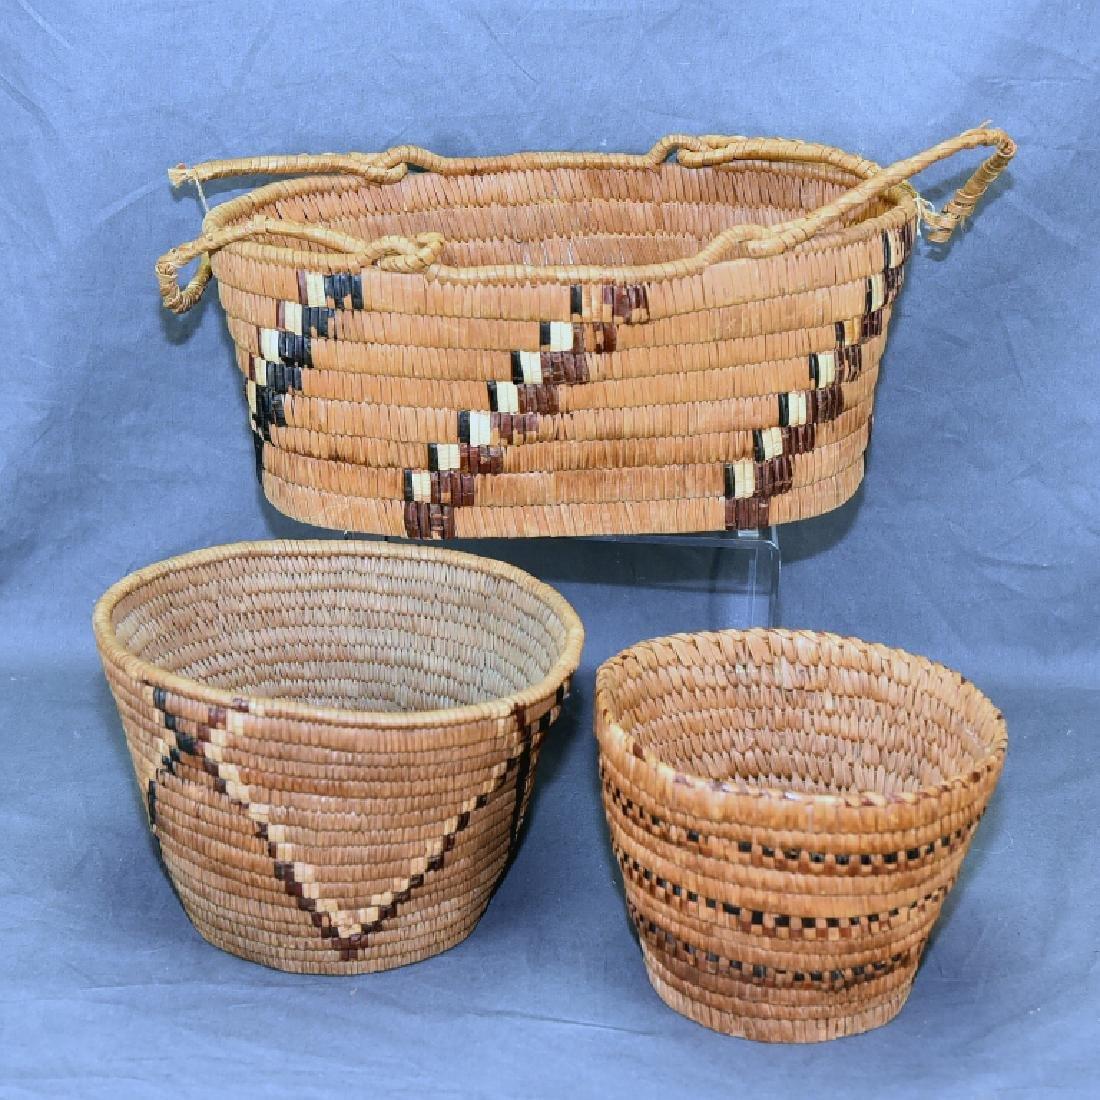 3 Thompson River Native American Baskets